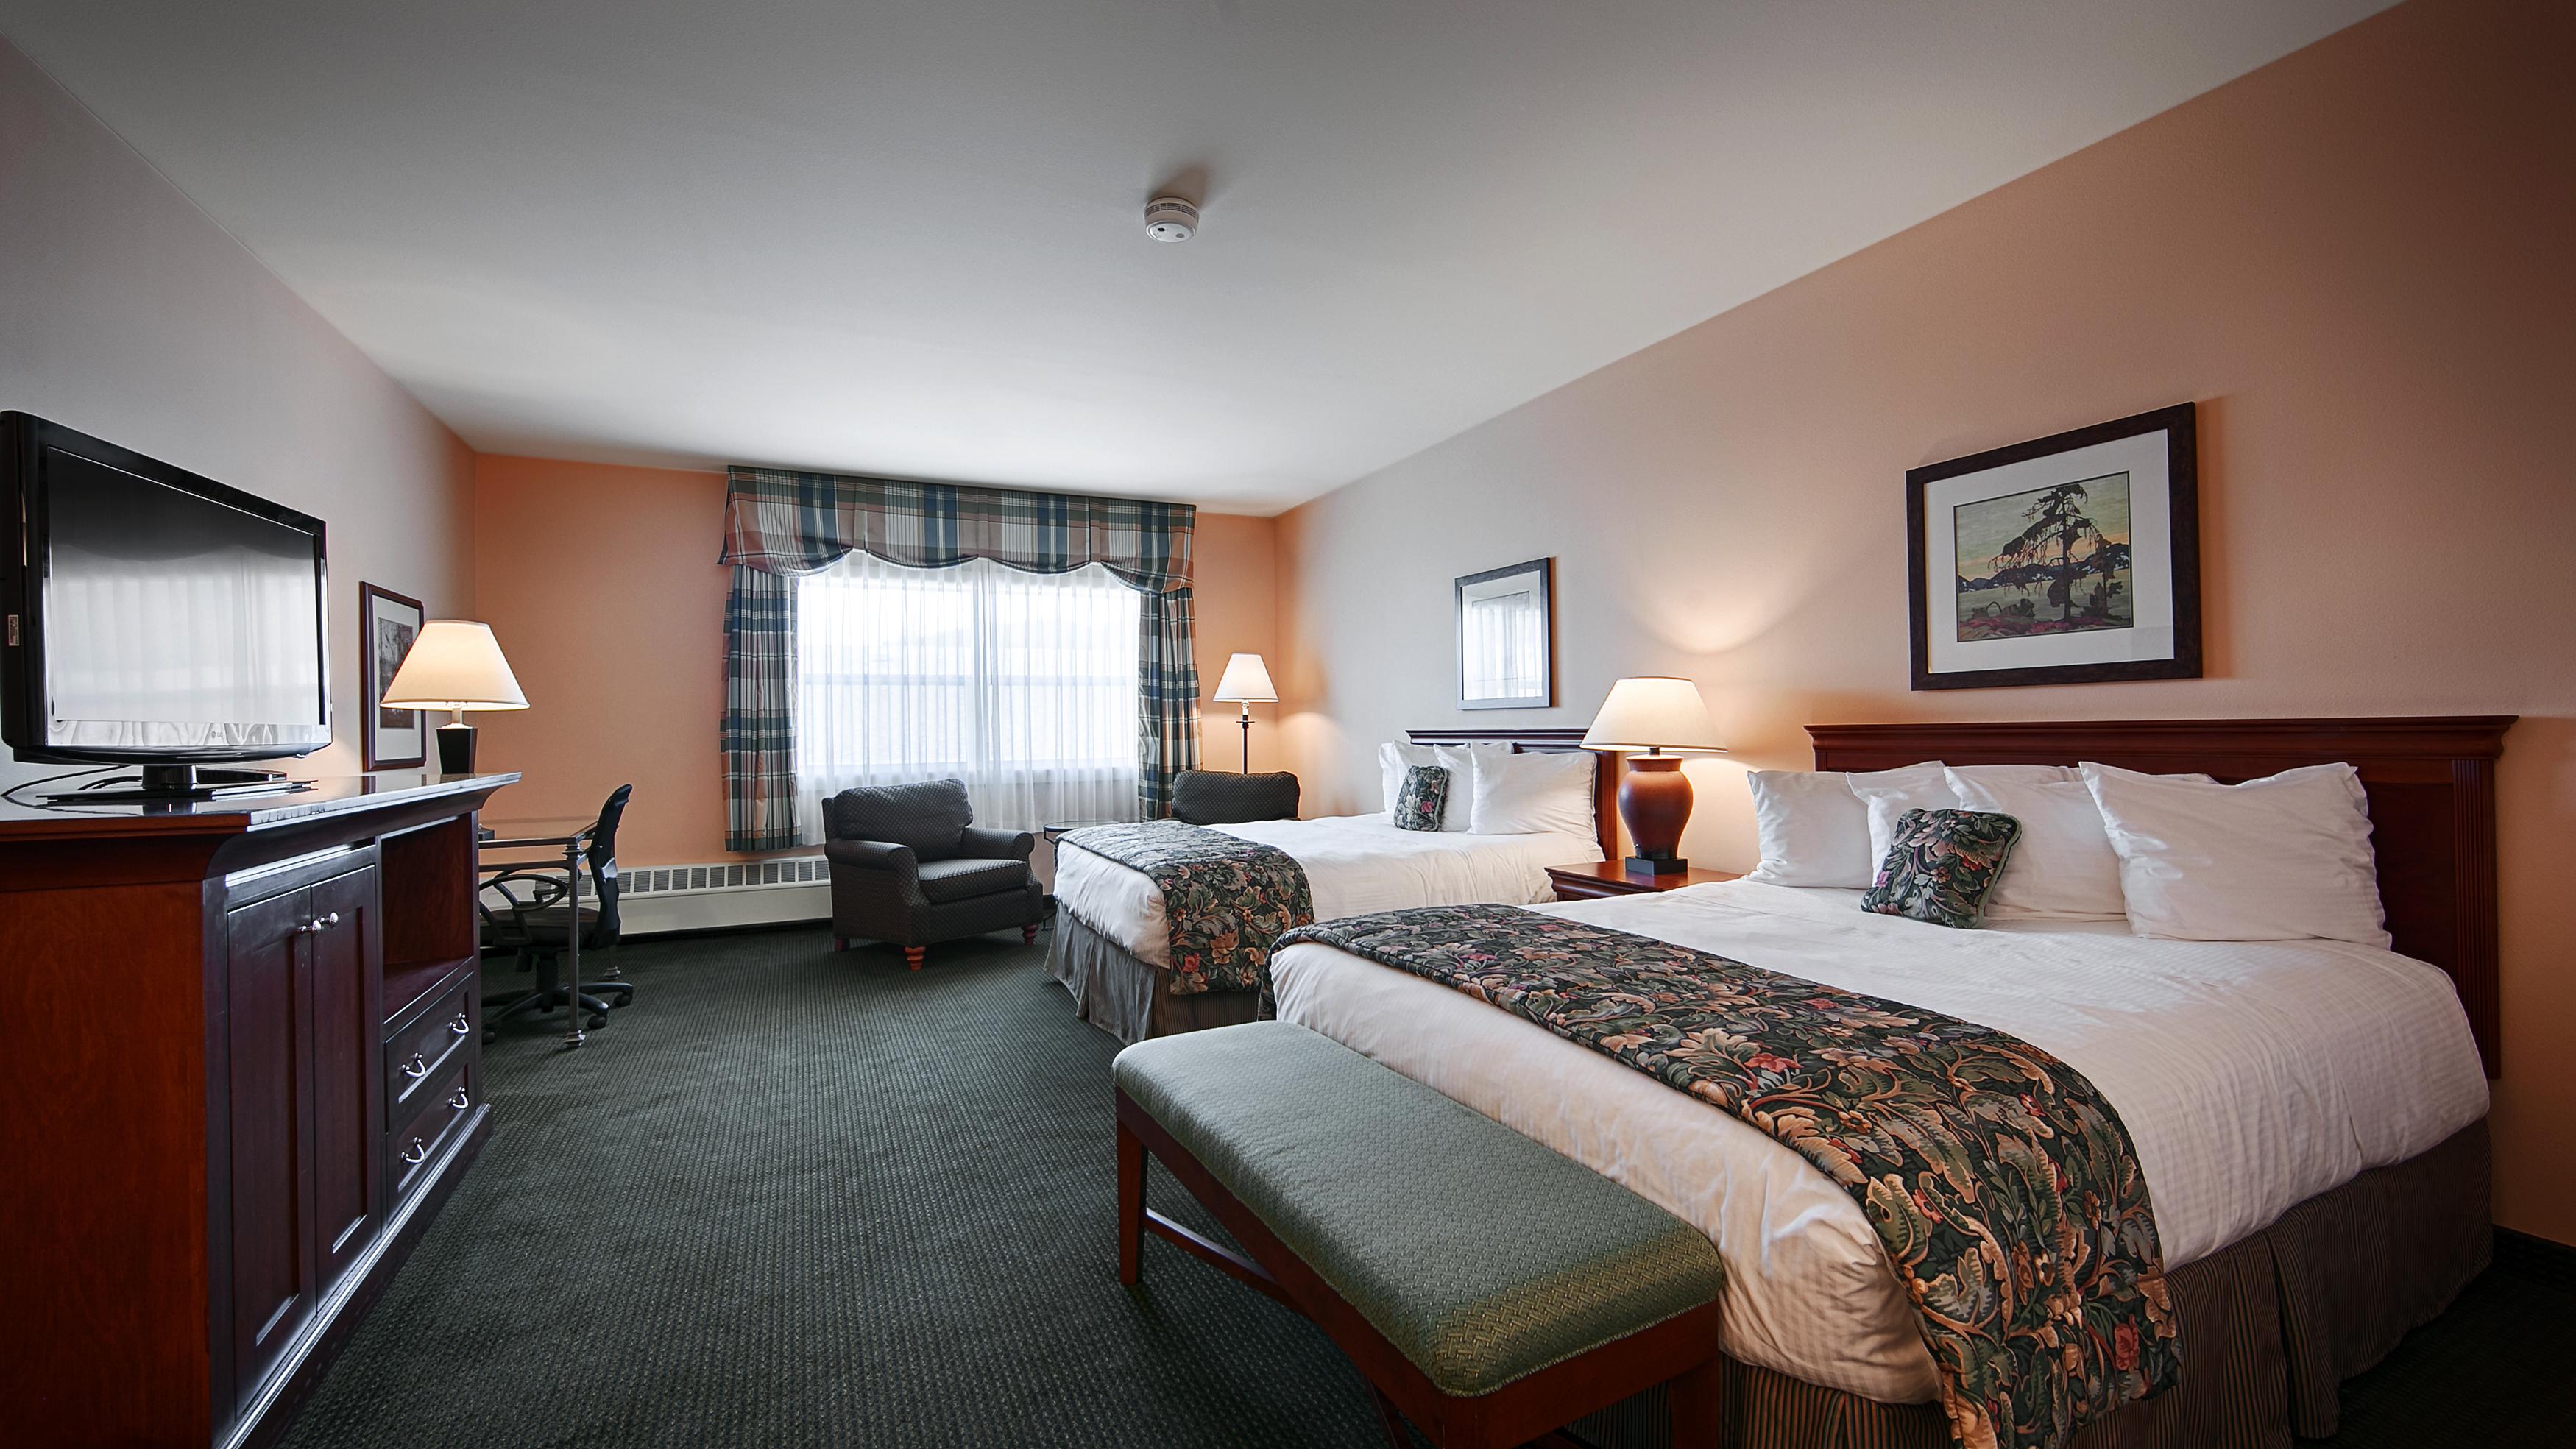 The Landing Hotel image 2